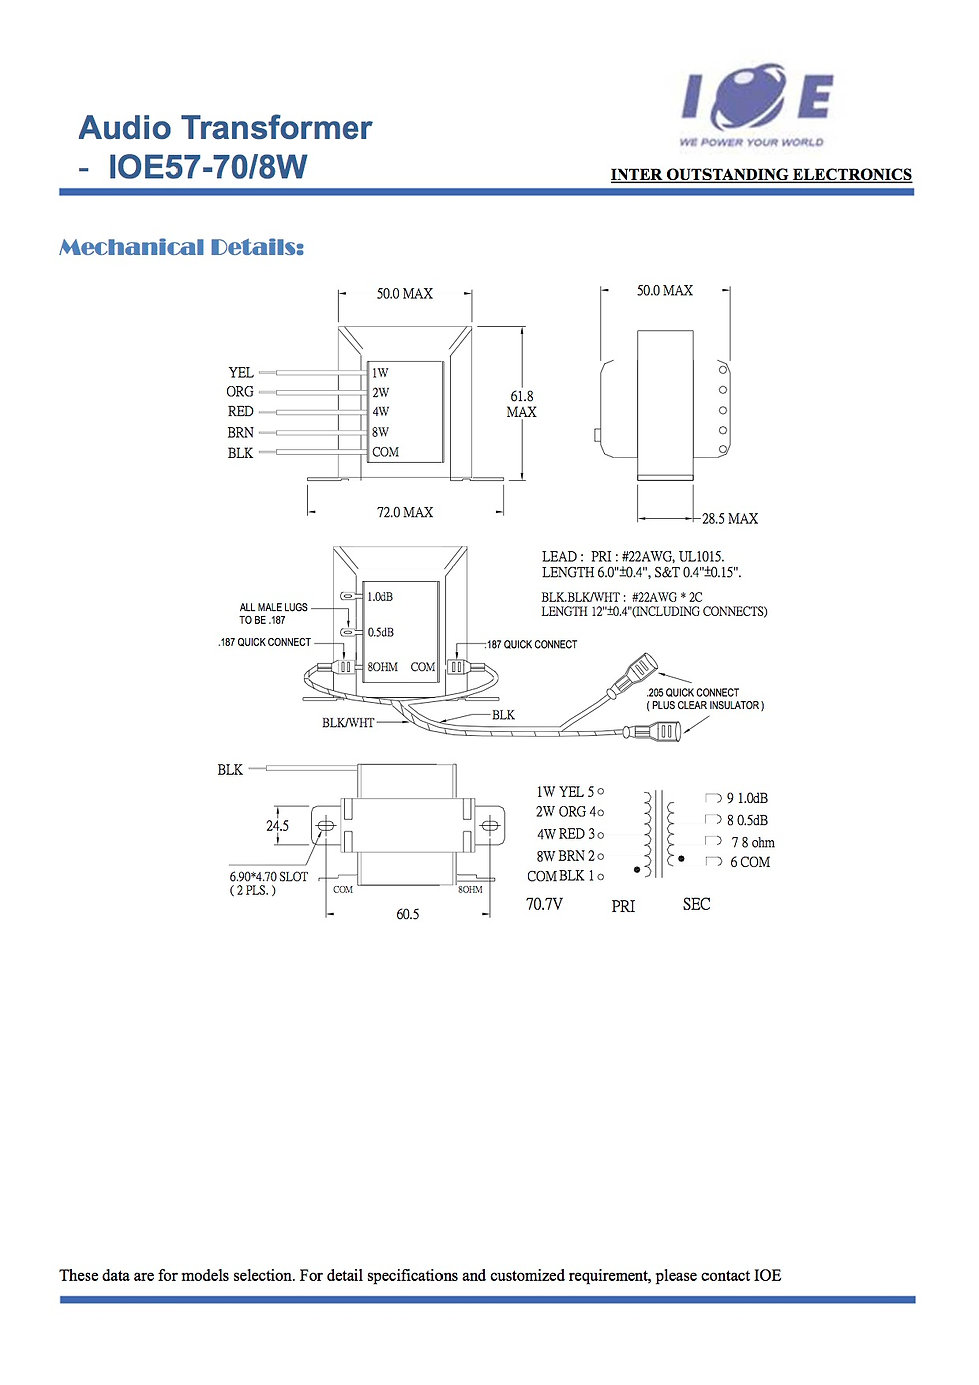 Audio Transformer_IOE57-70-8W_3.jpg